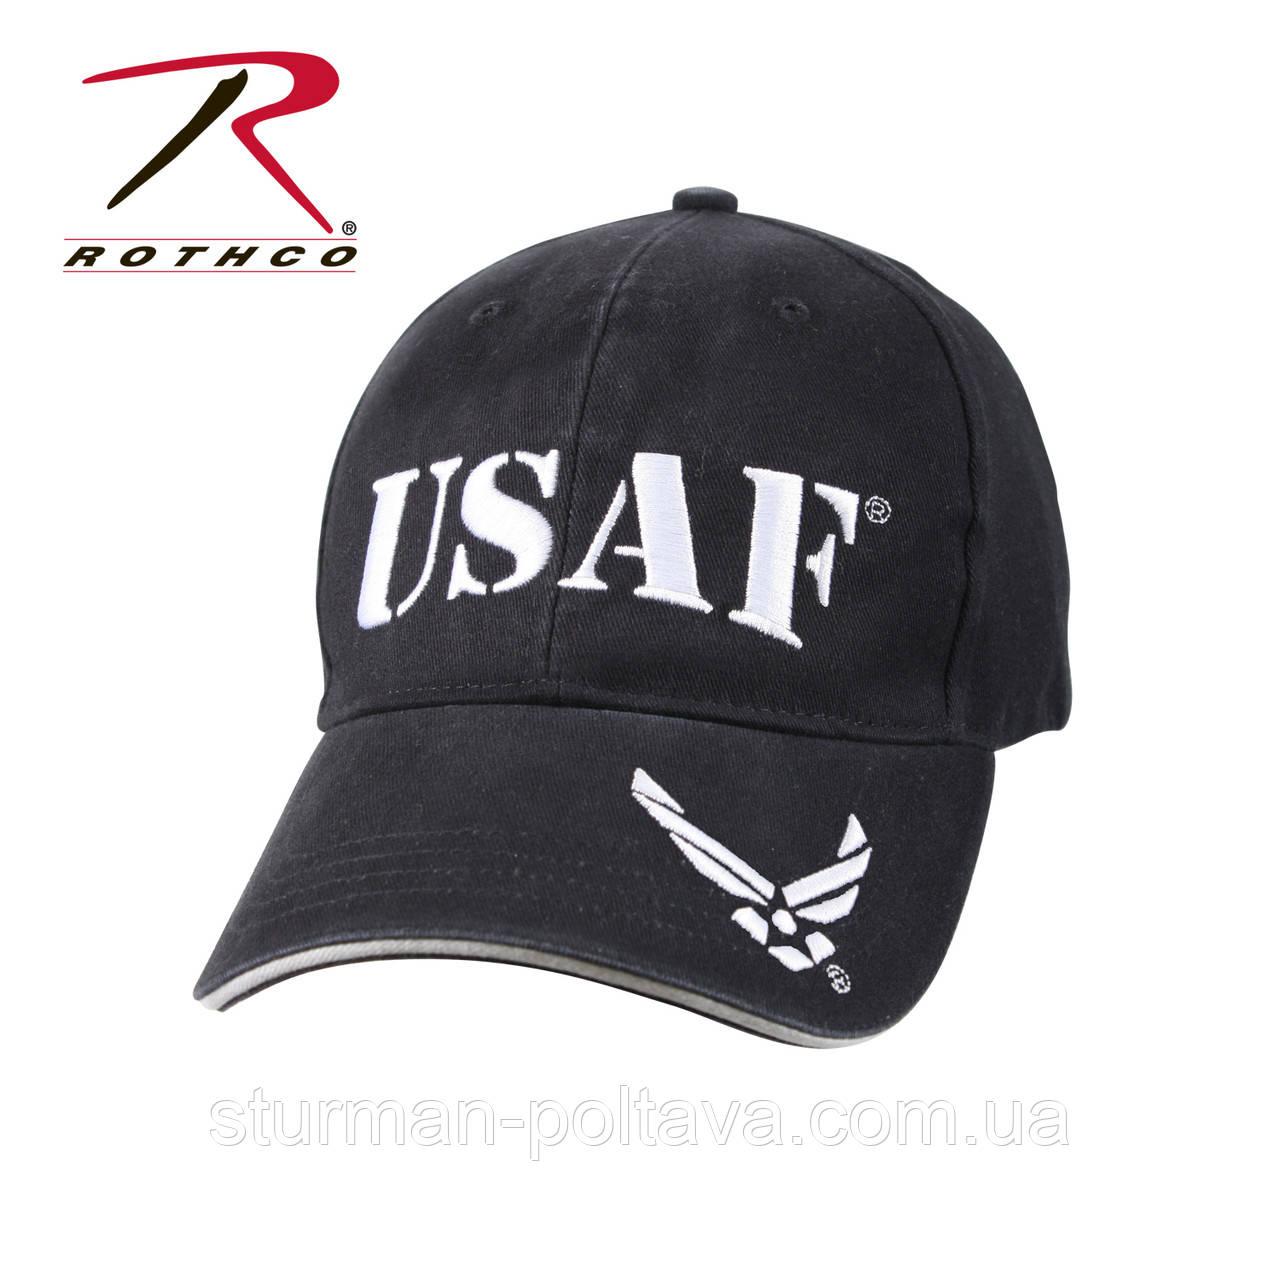 Бейсболка мужская ВВС США USAF Low Profile цвет темно -синяя оригинал Rotcho USA